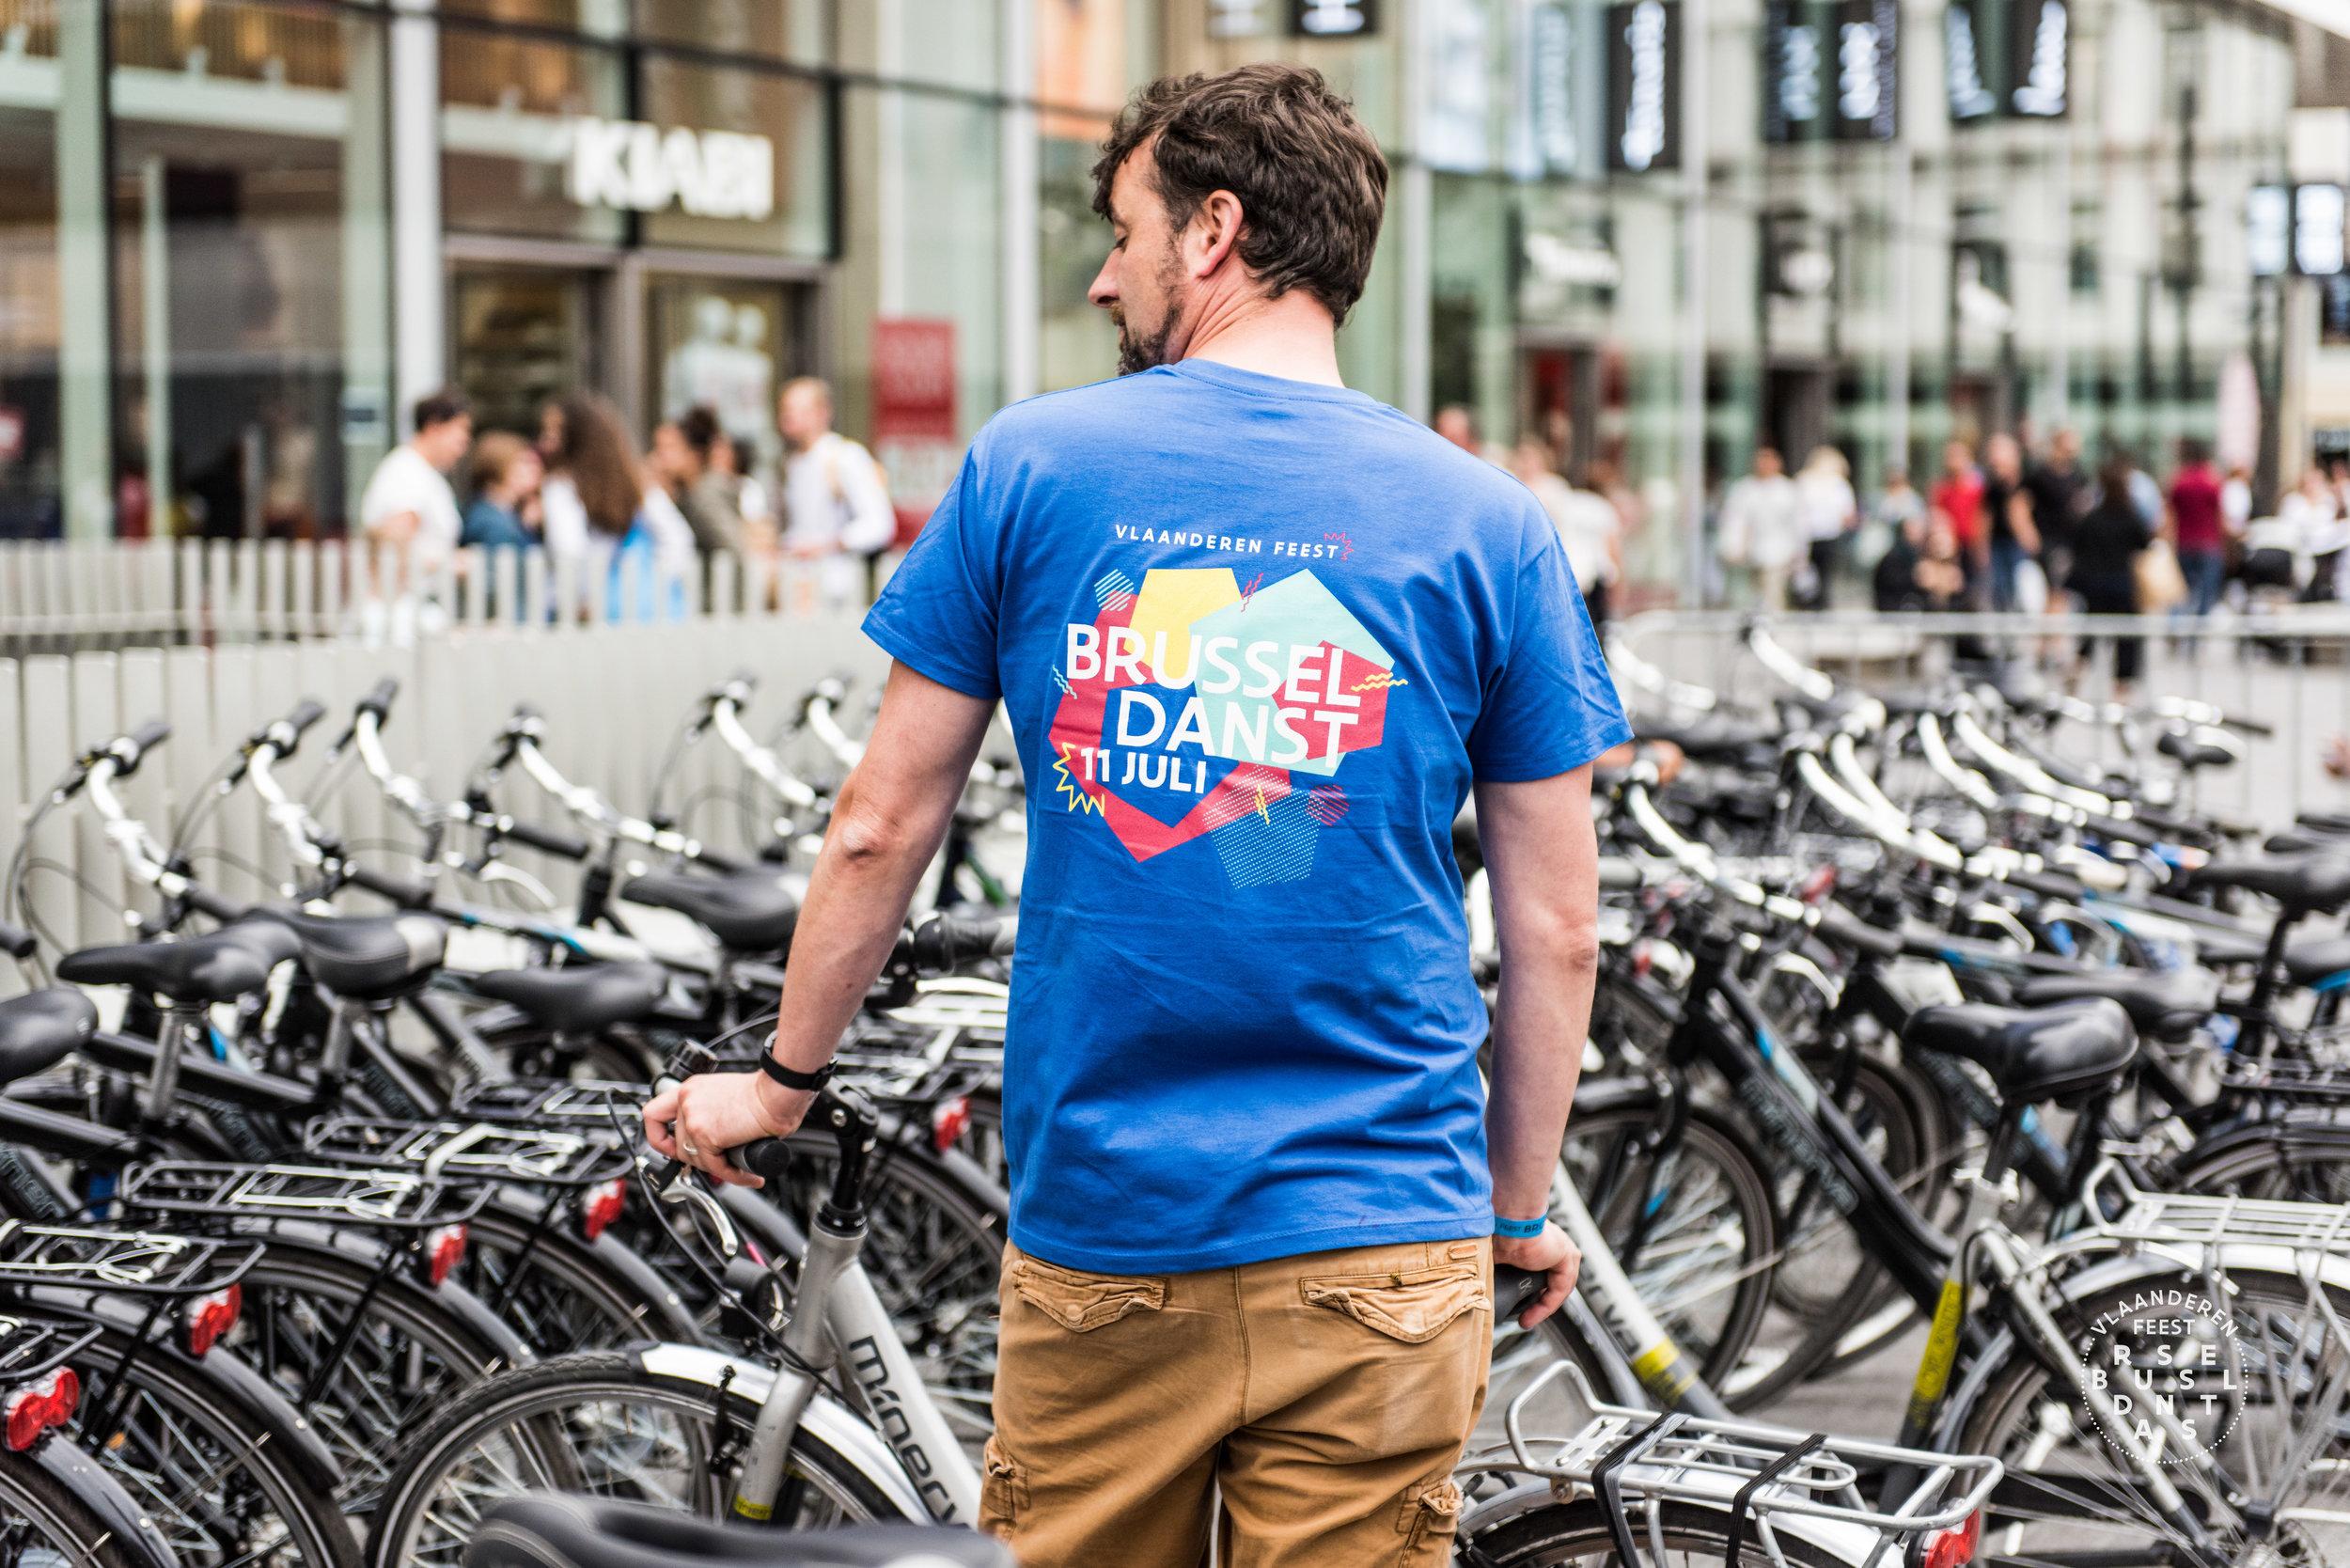 002_Brusseldanst_HIRES_logo.jpg